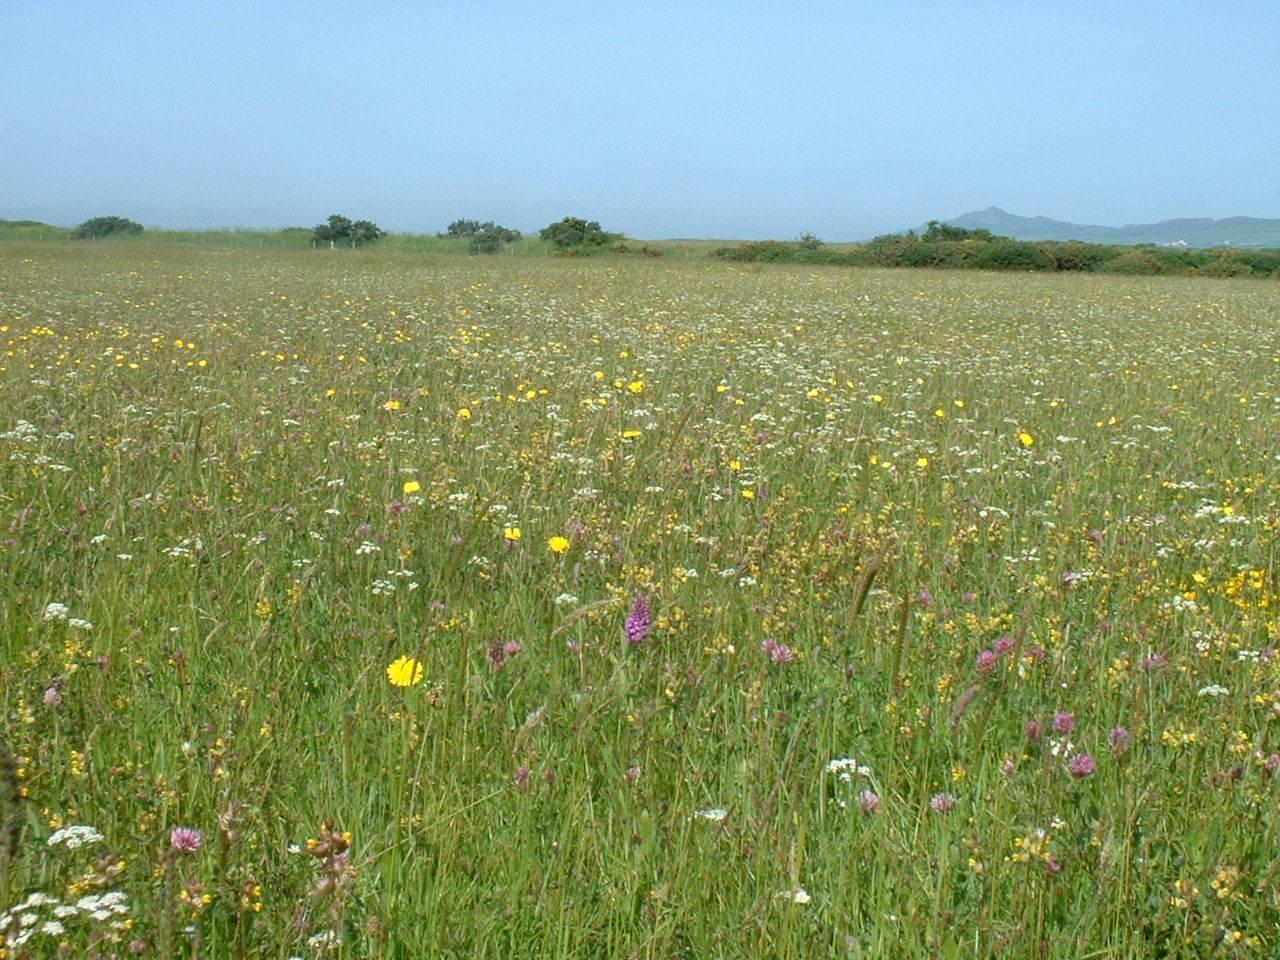 Wildflower Meadow on St Davids Airfield, Pembrokeshire Coast National Park, Pembrokeshire, Wales, UK